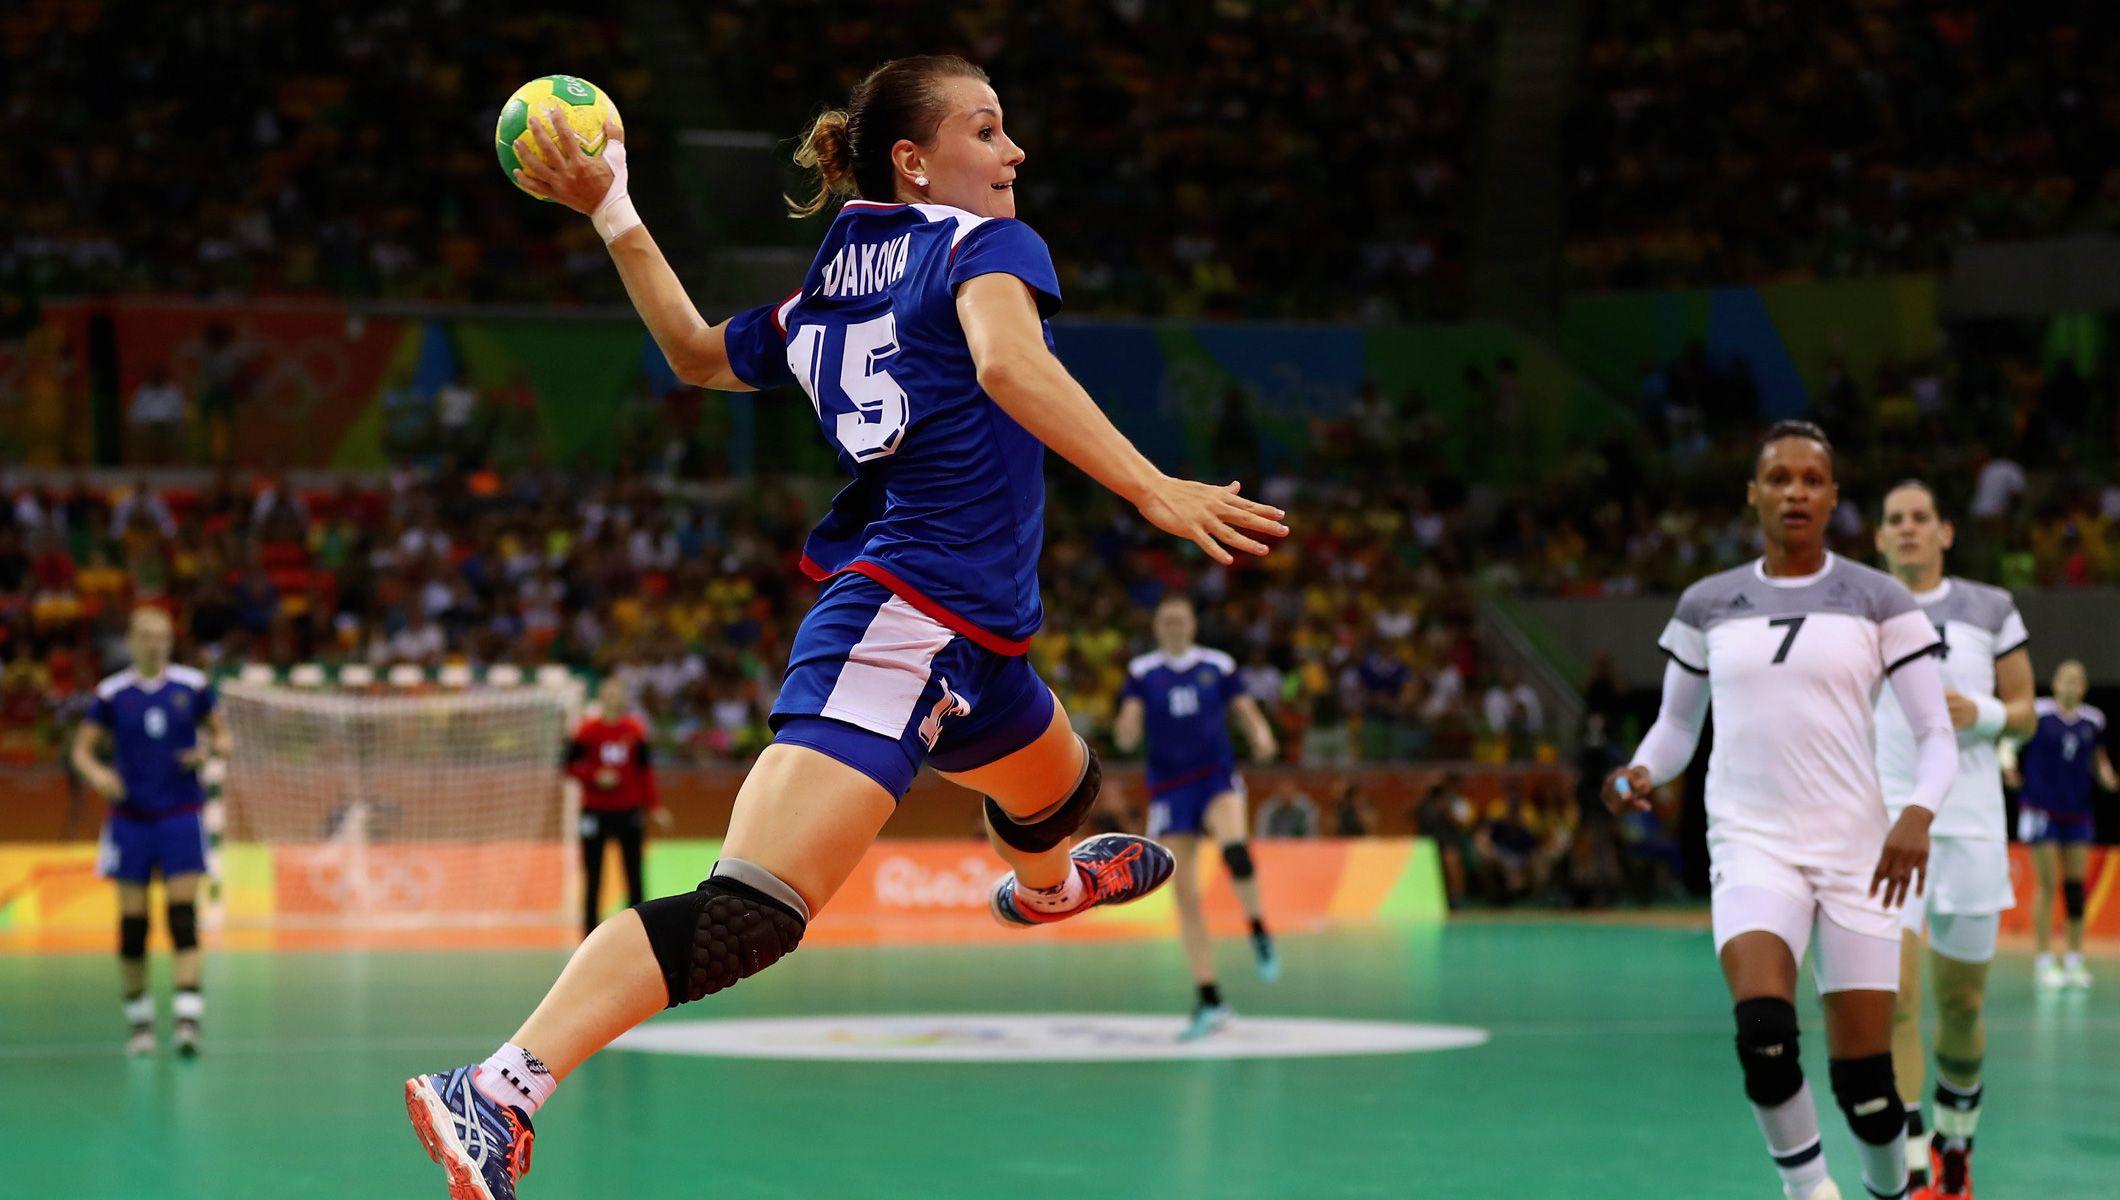 b2cdb2ea06d5 Russia s women s handball team won their first Olympic gold ...